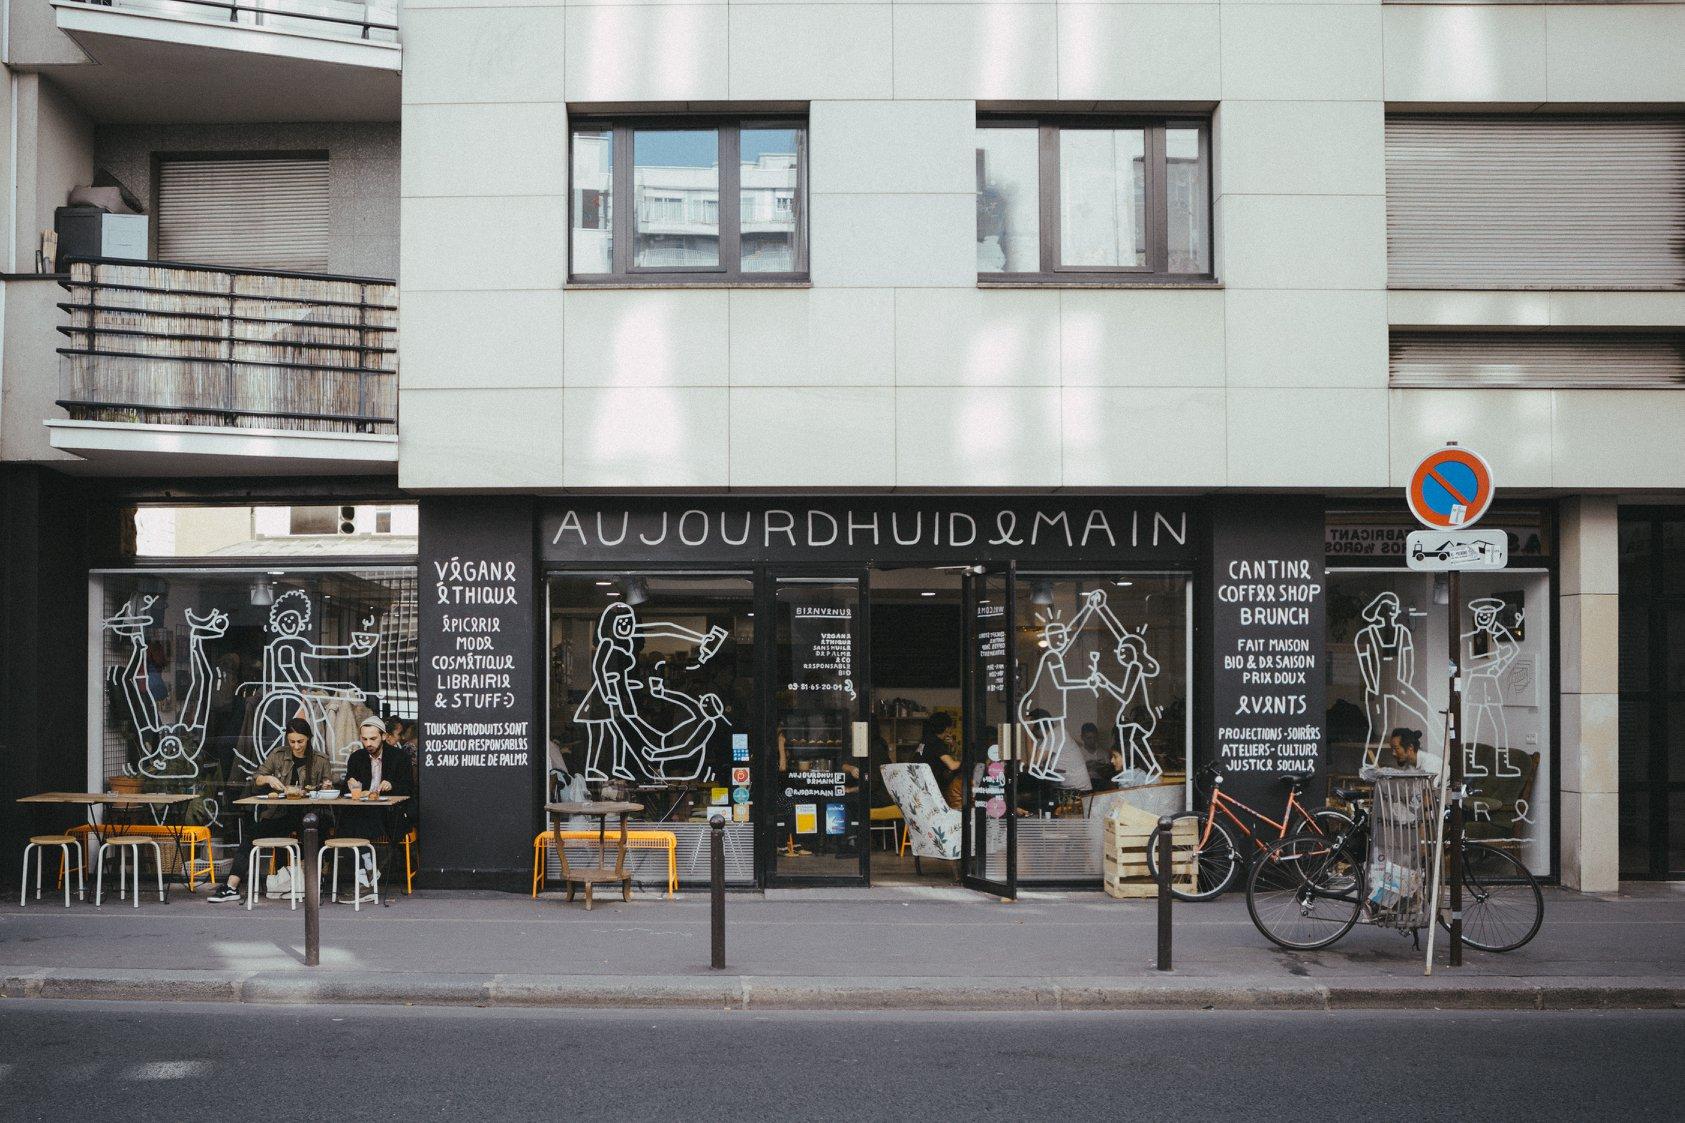 aujourdhui-demain-paris-mmm-store-vegan